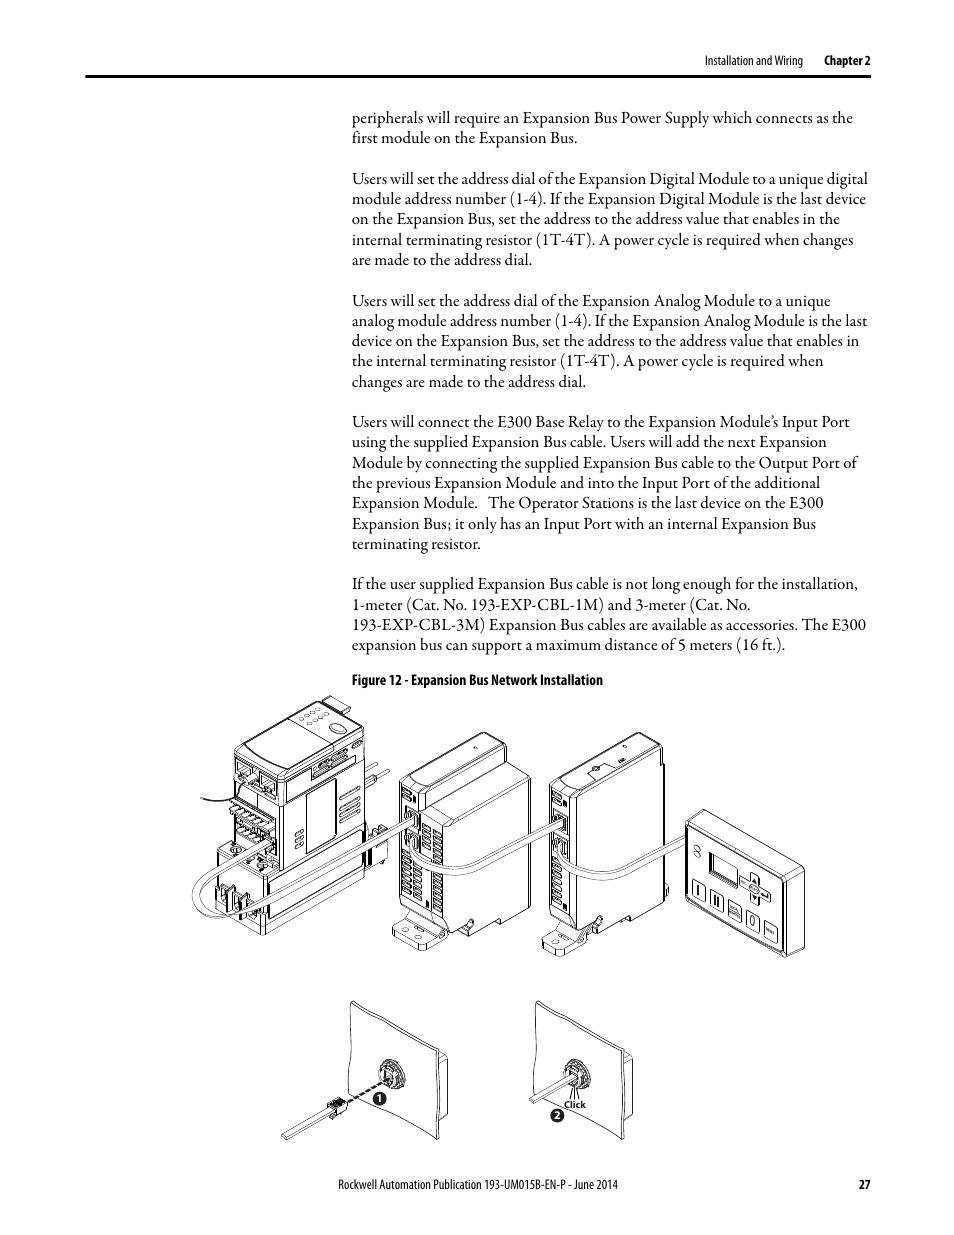 Figure 12 - expansion bus network installation 0 | Rockwell ... on ml430 wiring diagram, 300td wiring diagram, 300te wiring diagram, ml350 wiring diagram, ml320 wiring diagram, e320 wiring diagram, c220 wiring diagram, 300e wiring diagram, e350 wiring diagram, cl500 wiring diagram, s430 wiring diagram, c280 wiring diagram, c100 wiring diagram, gl450 wiring diagram, cls550 wiring diagram, s100 wiring diagram, s300 wiring diagram, b100 wiring diagram, e150 wiring diagram, slk230 wiring diagram,